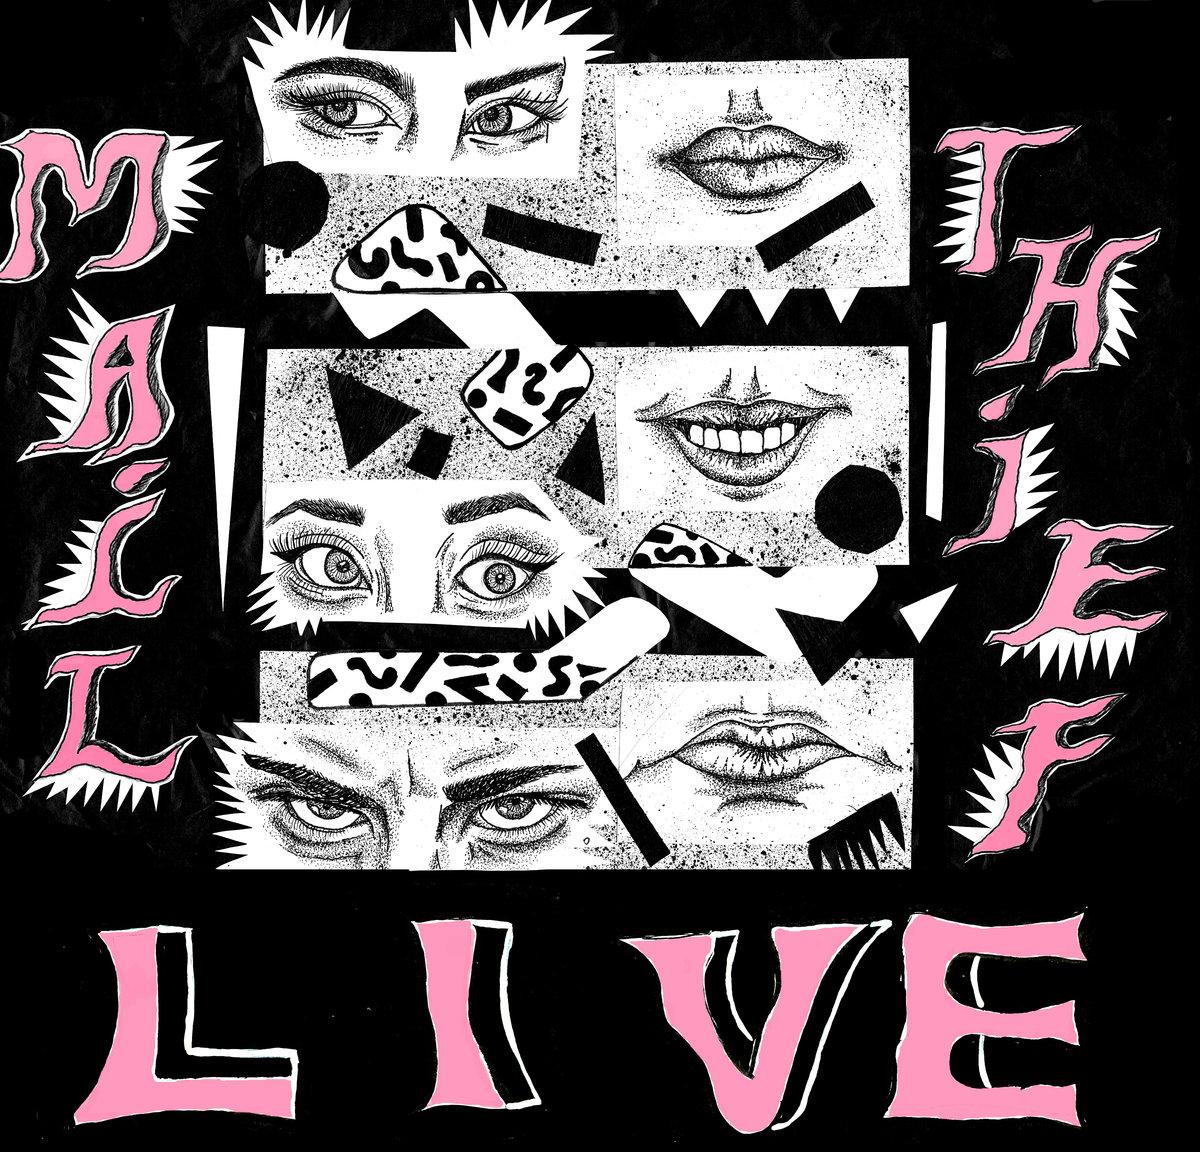 Mail Thief - Live